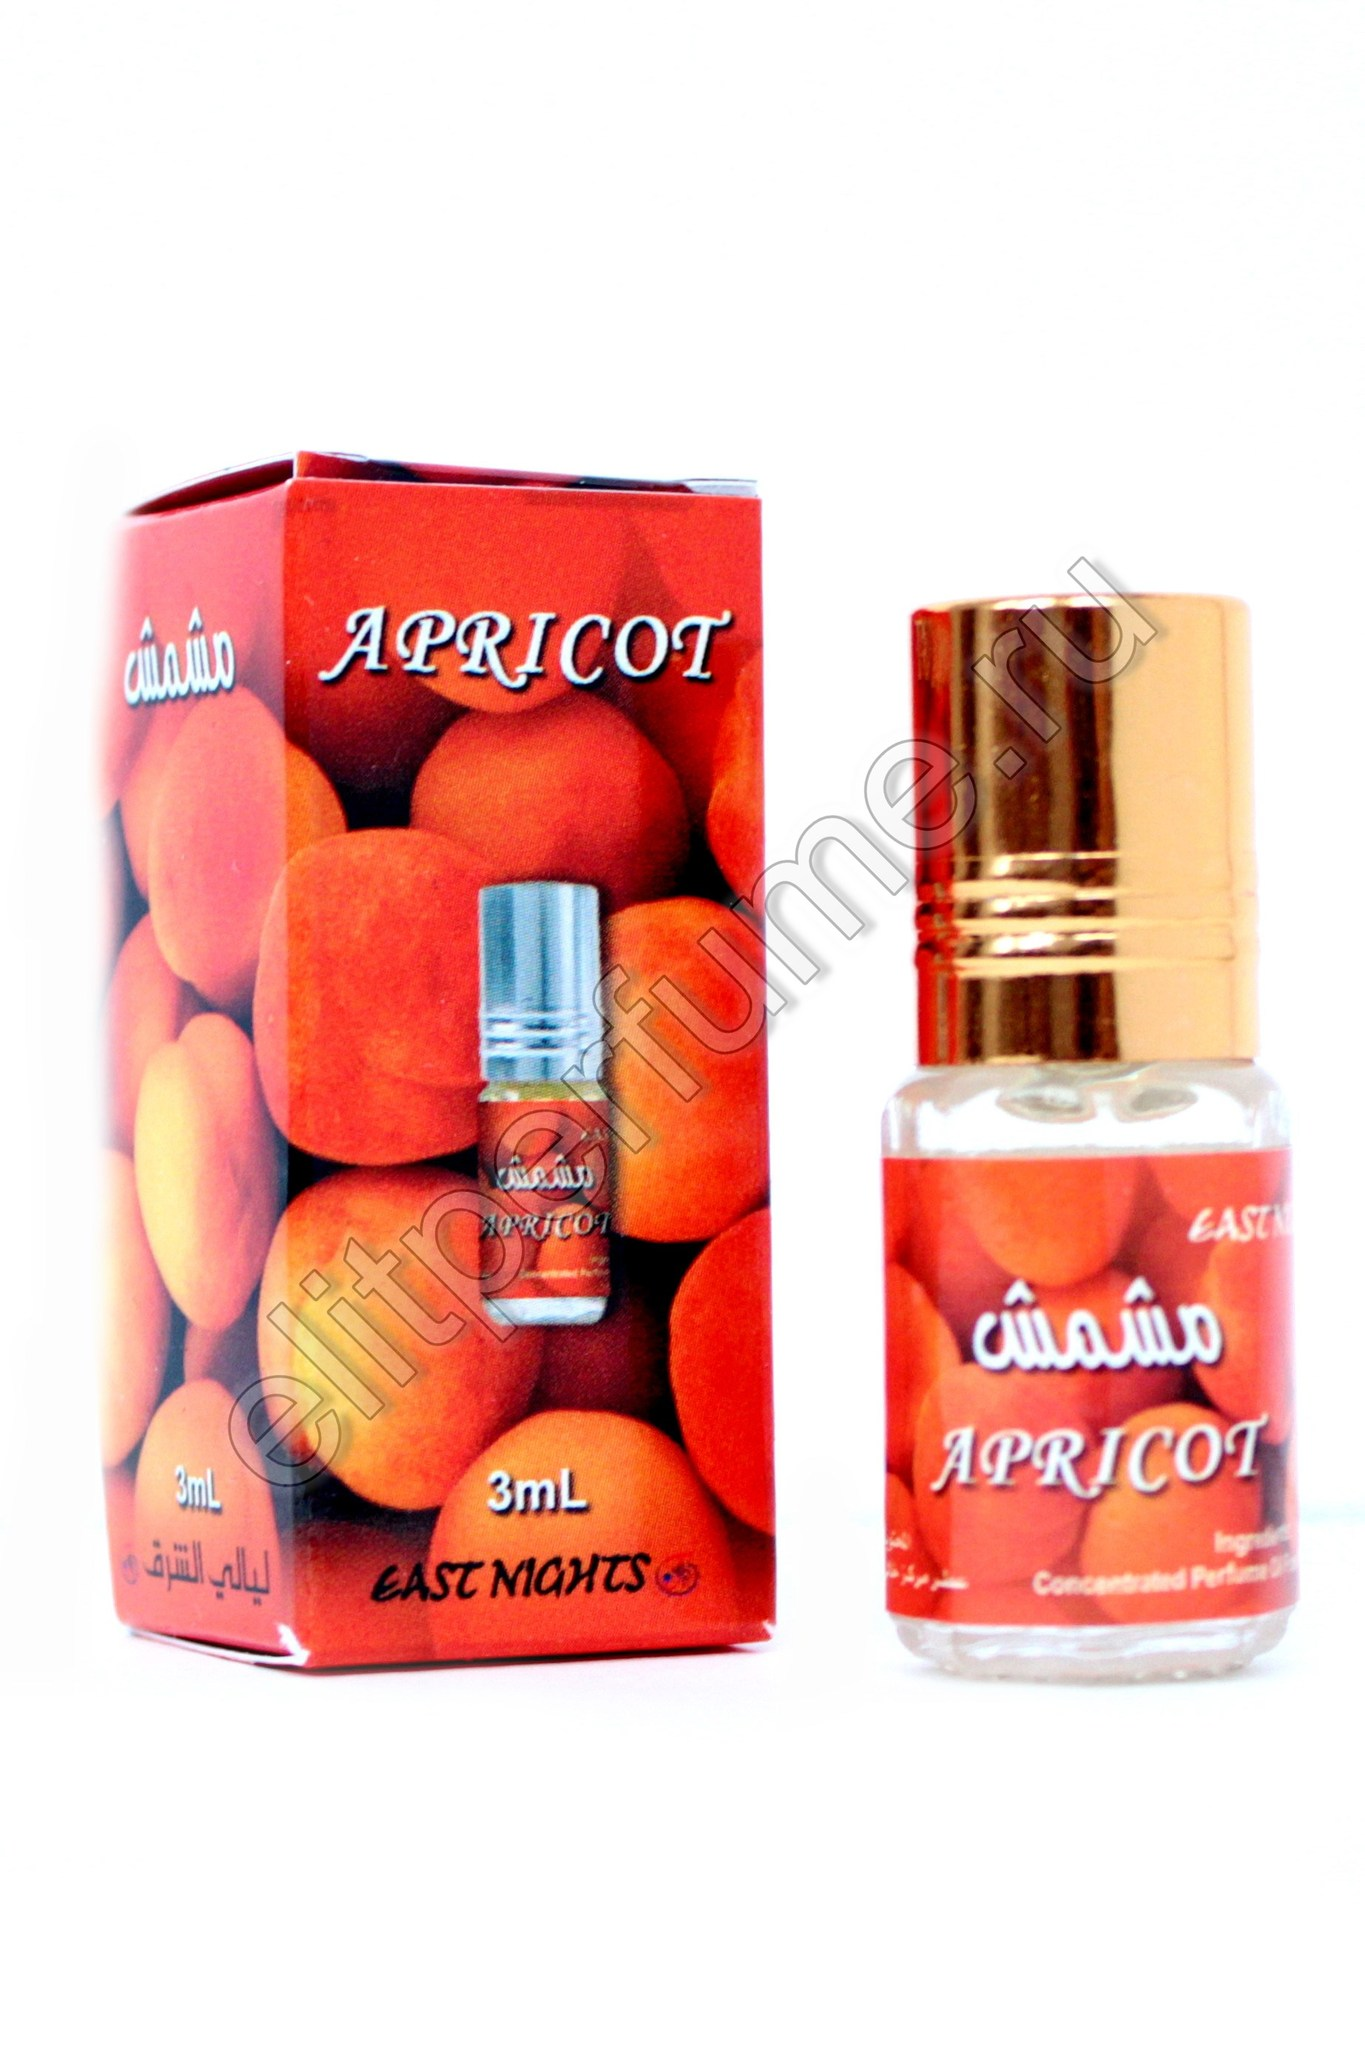 Apricot Априкот 3 мл